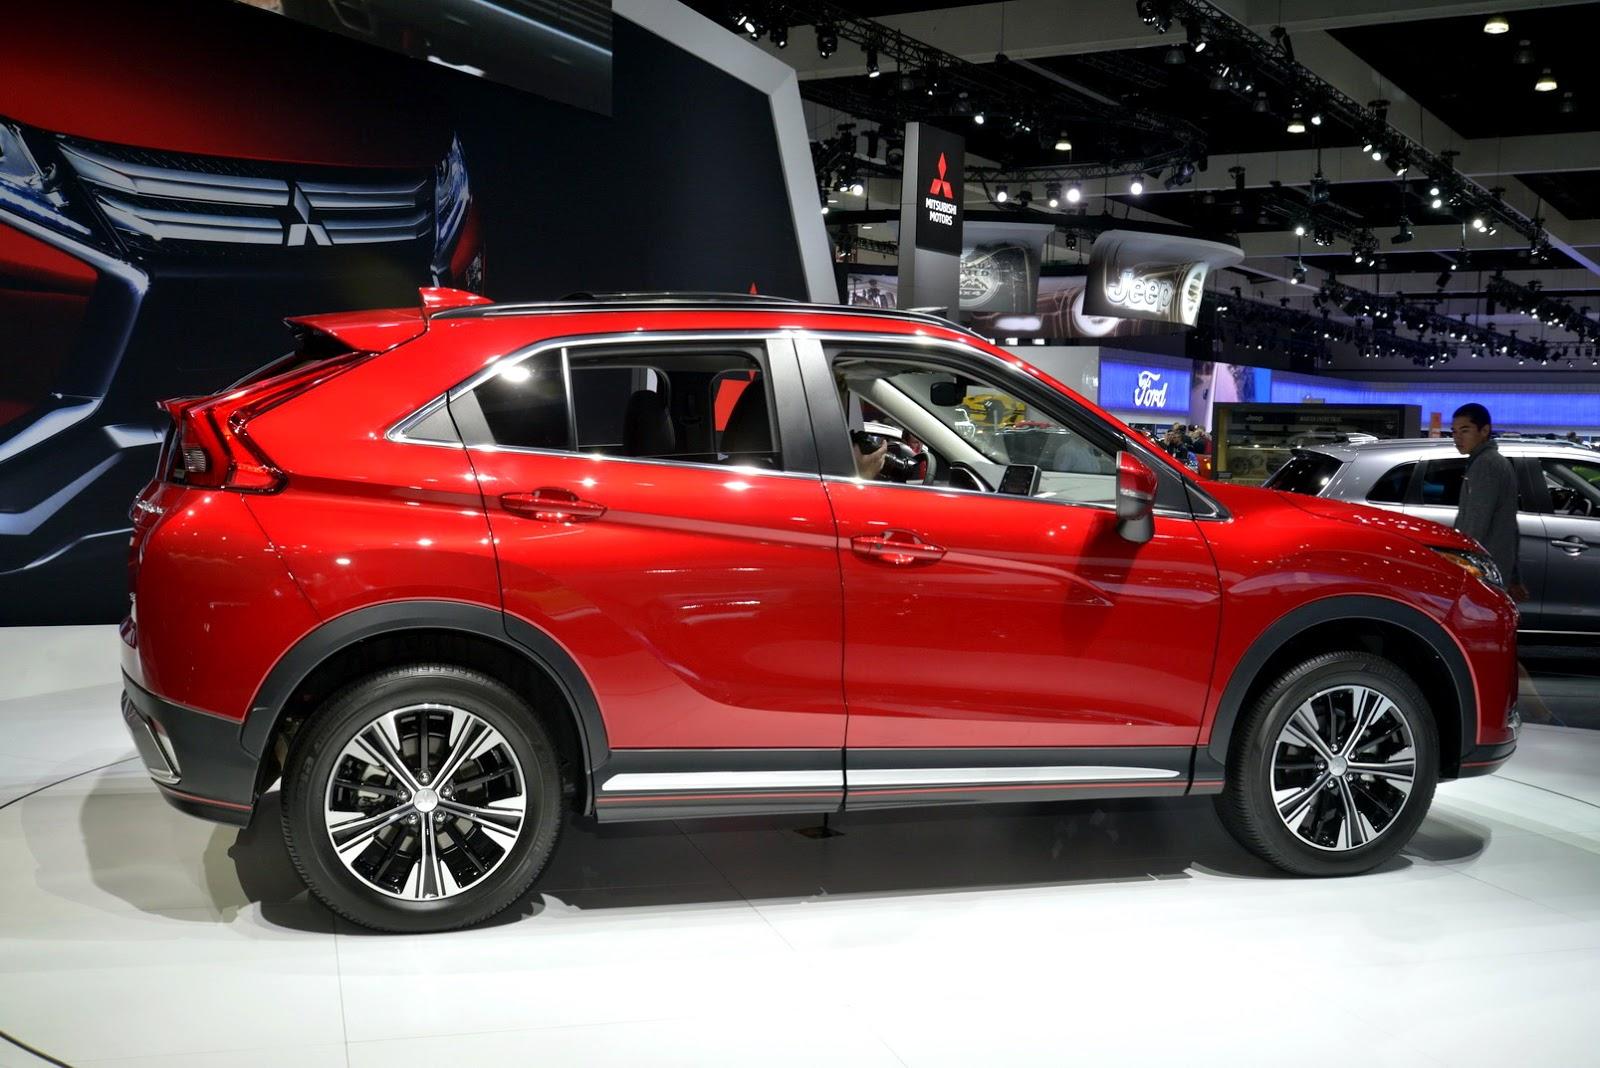 Unlock Car Door >> New Mitsubishi Eclipse Cross Lands In LA With A $23,295 ...